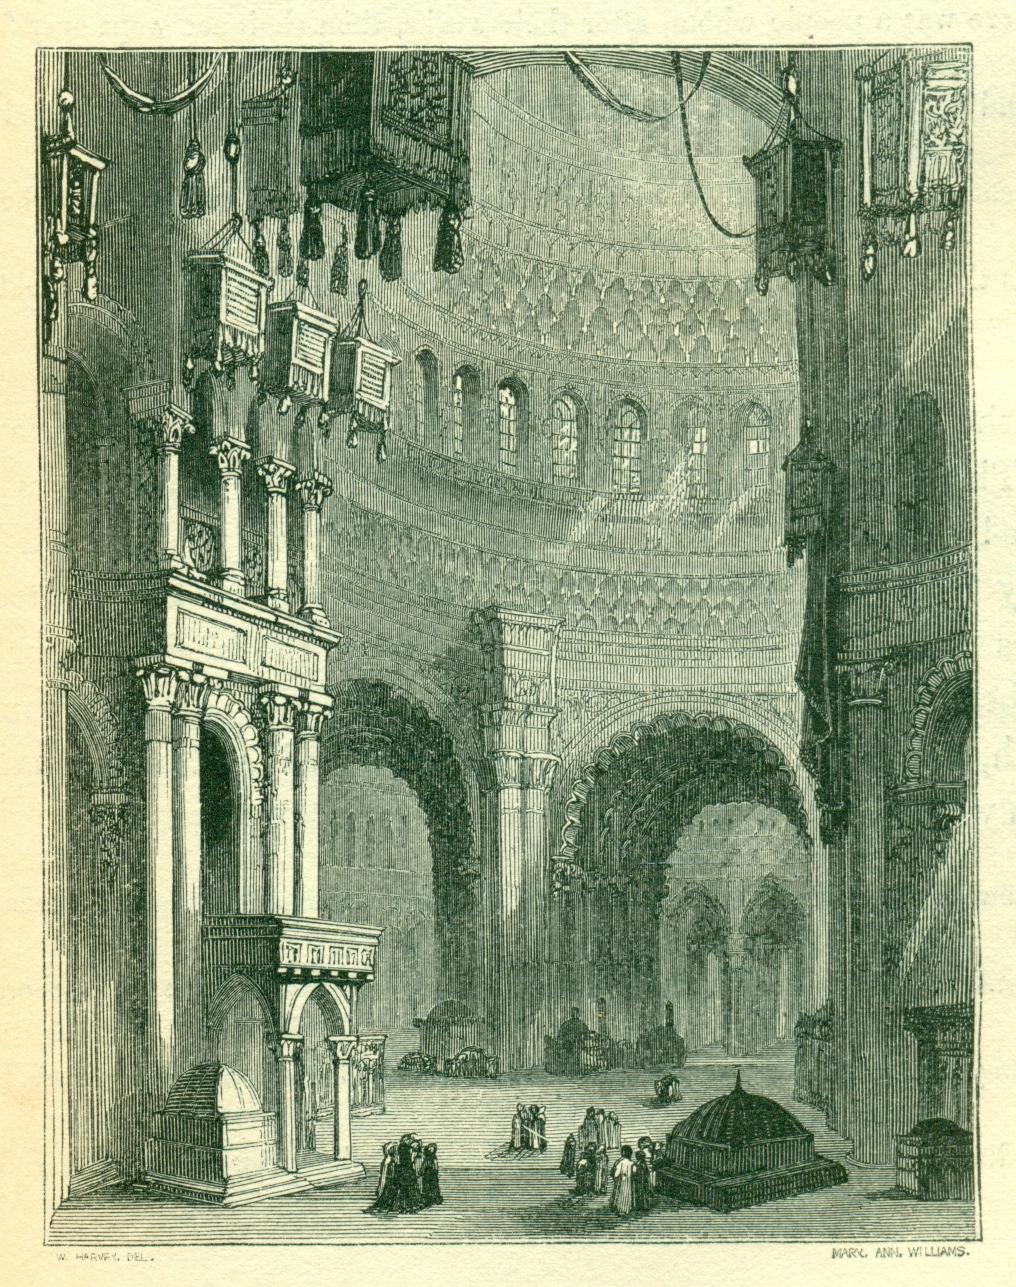 Design by William Harvey